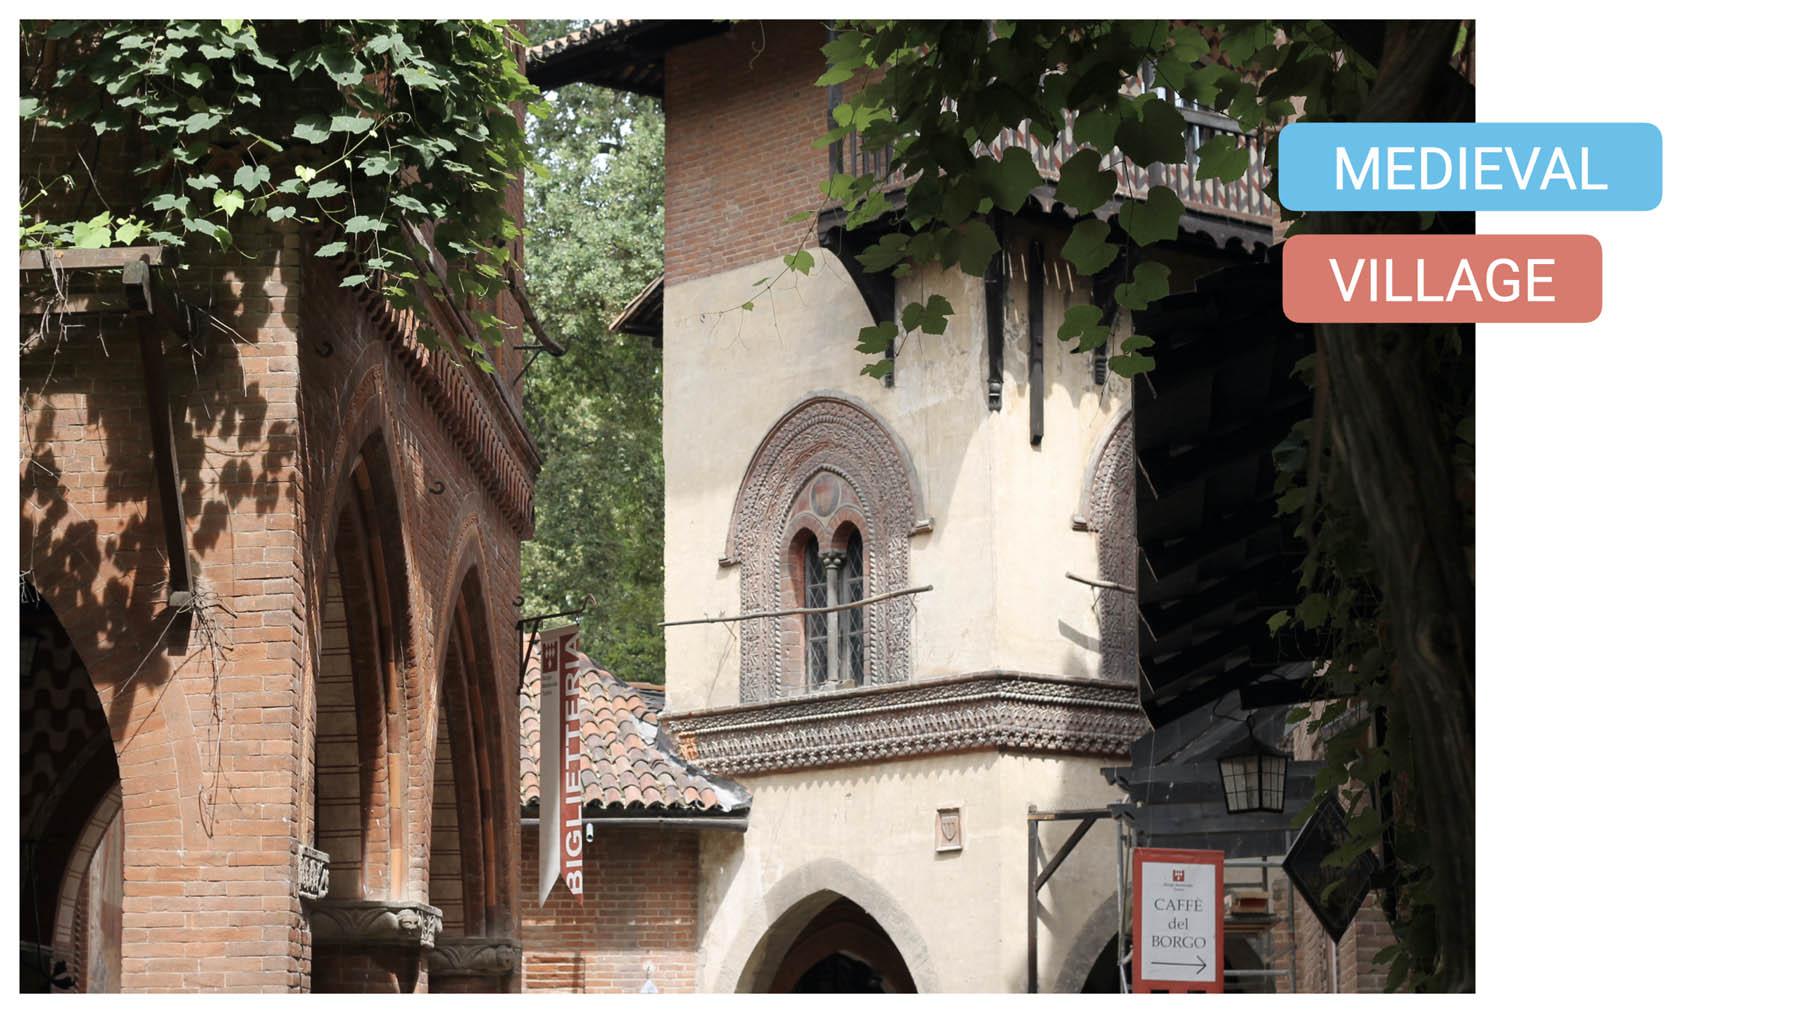 visit turin parco valentino bike tour torino medieval village